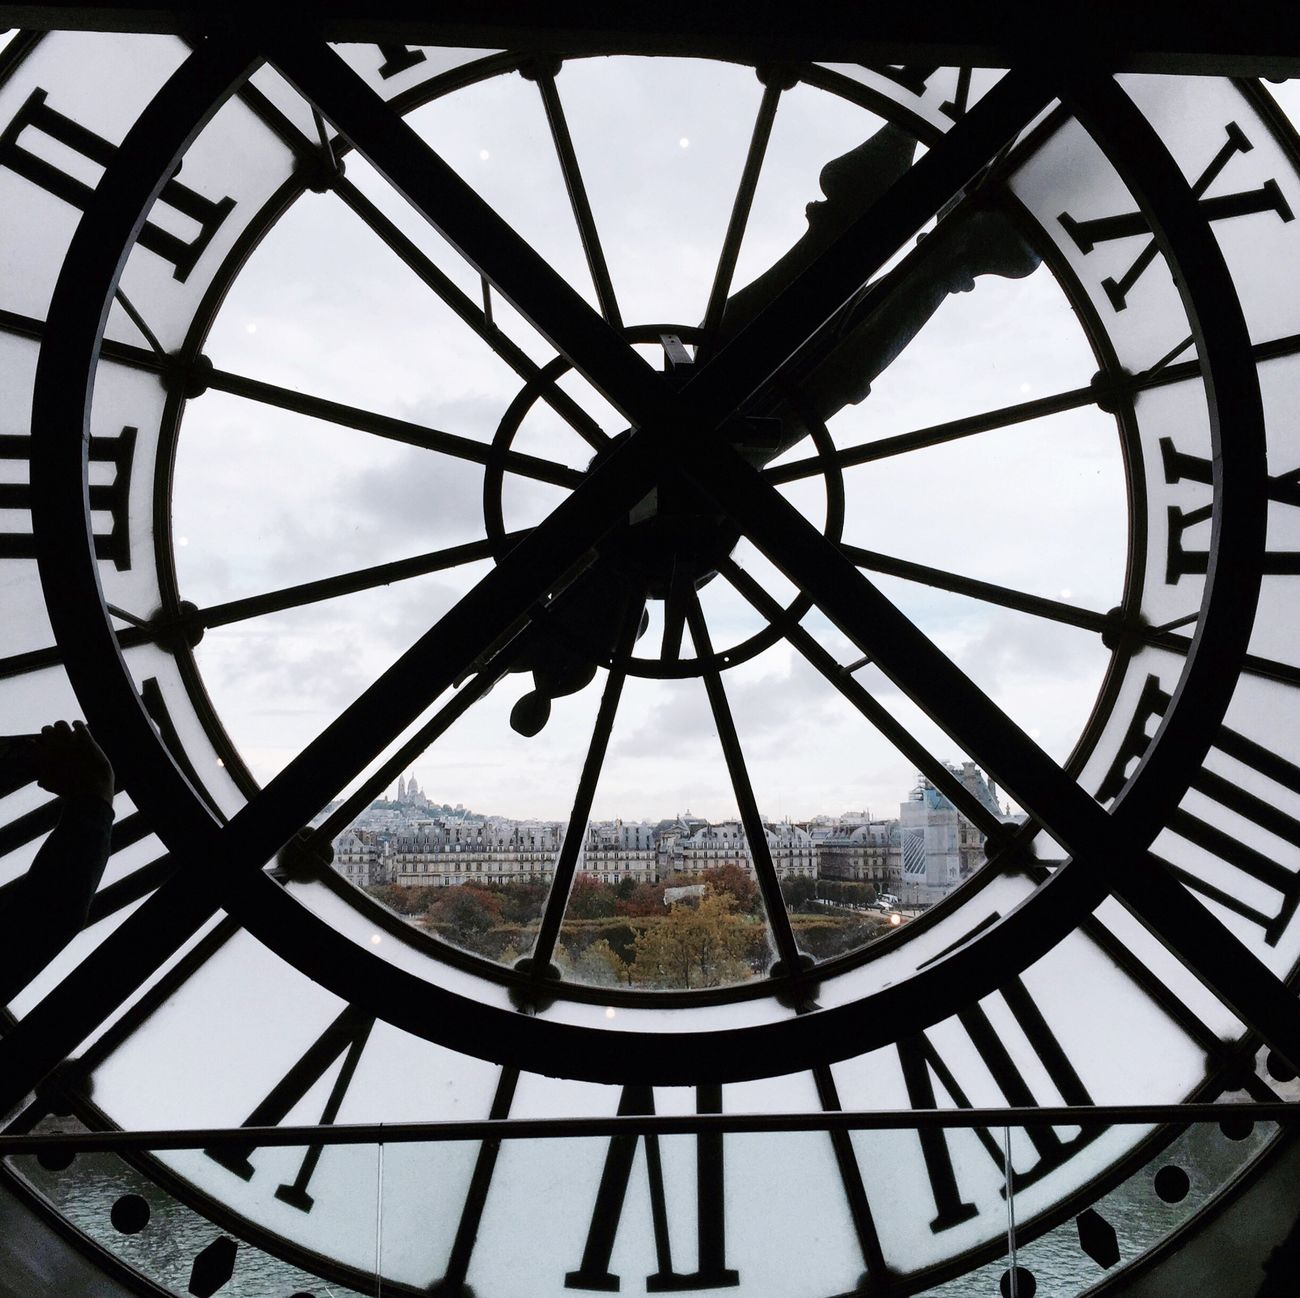 Enjoying Life Trip Good Times Playing Photography Taking Photos Awesome Nice View Hello World EyeEm Photo France Orsay Watch Paris Clock Museum